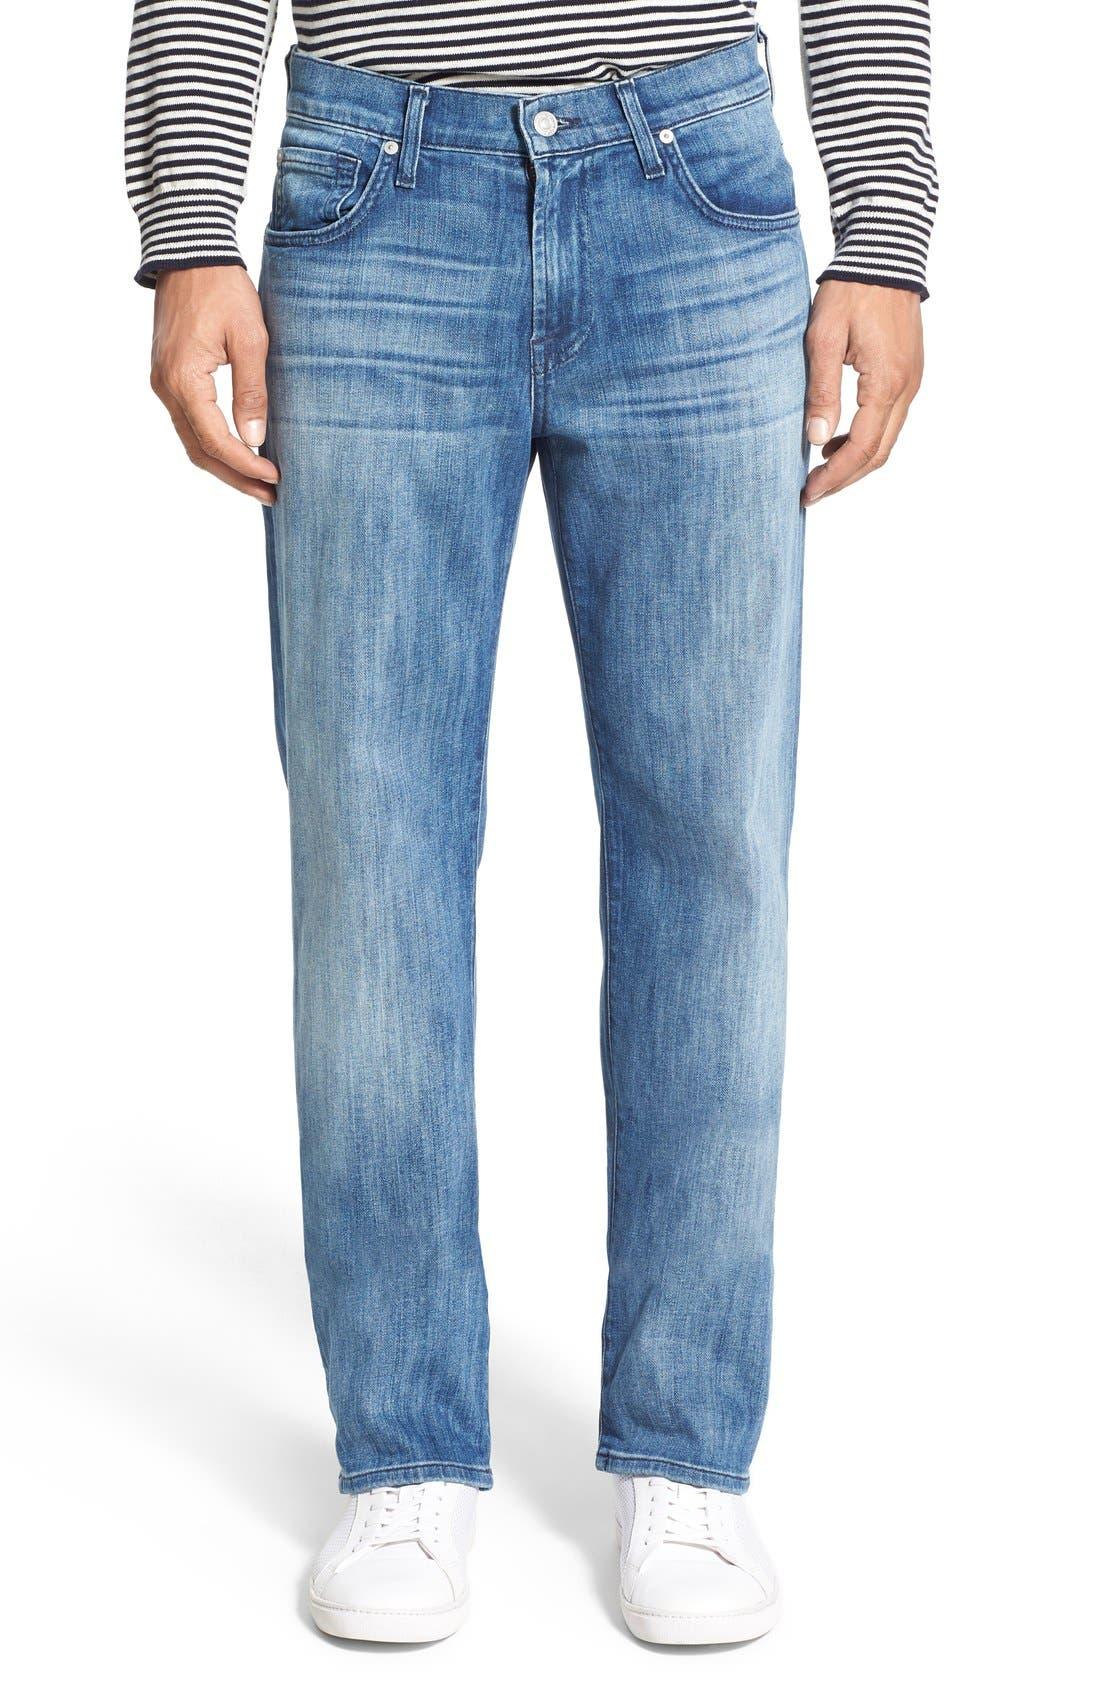 Alternate Image 1 Selected - 7 For All Mankind® Austyn Relaxed Straight Leg Jeans (Nakkitta Blue)